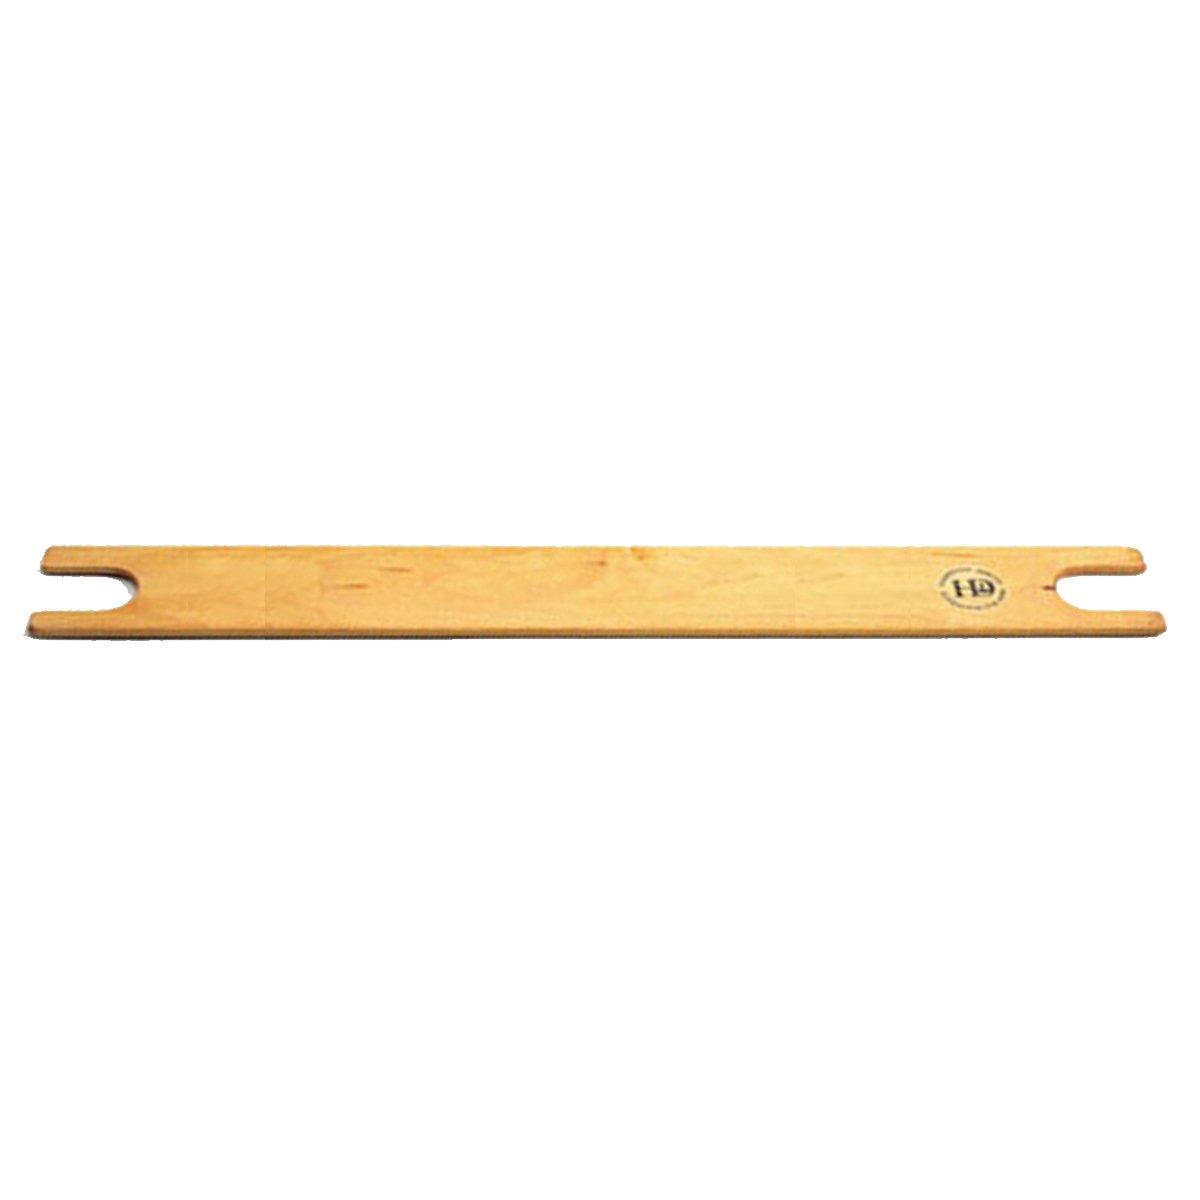 2 Flat Wooden Stick Shuttles - 16 inch - by Harrisville Designs by Harrisville Designs